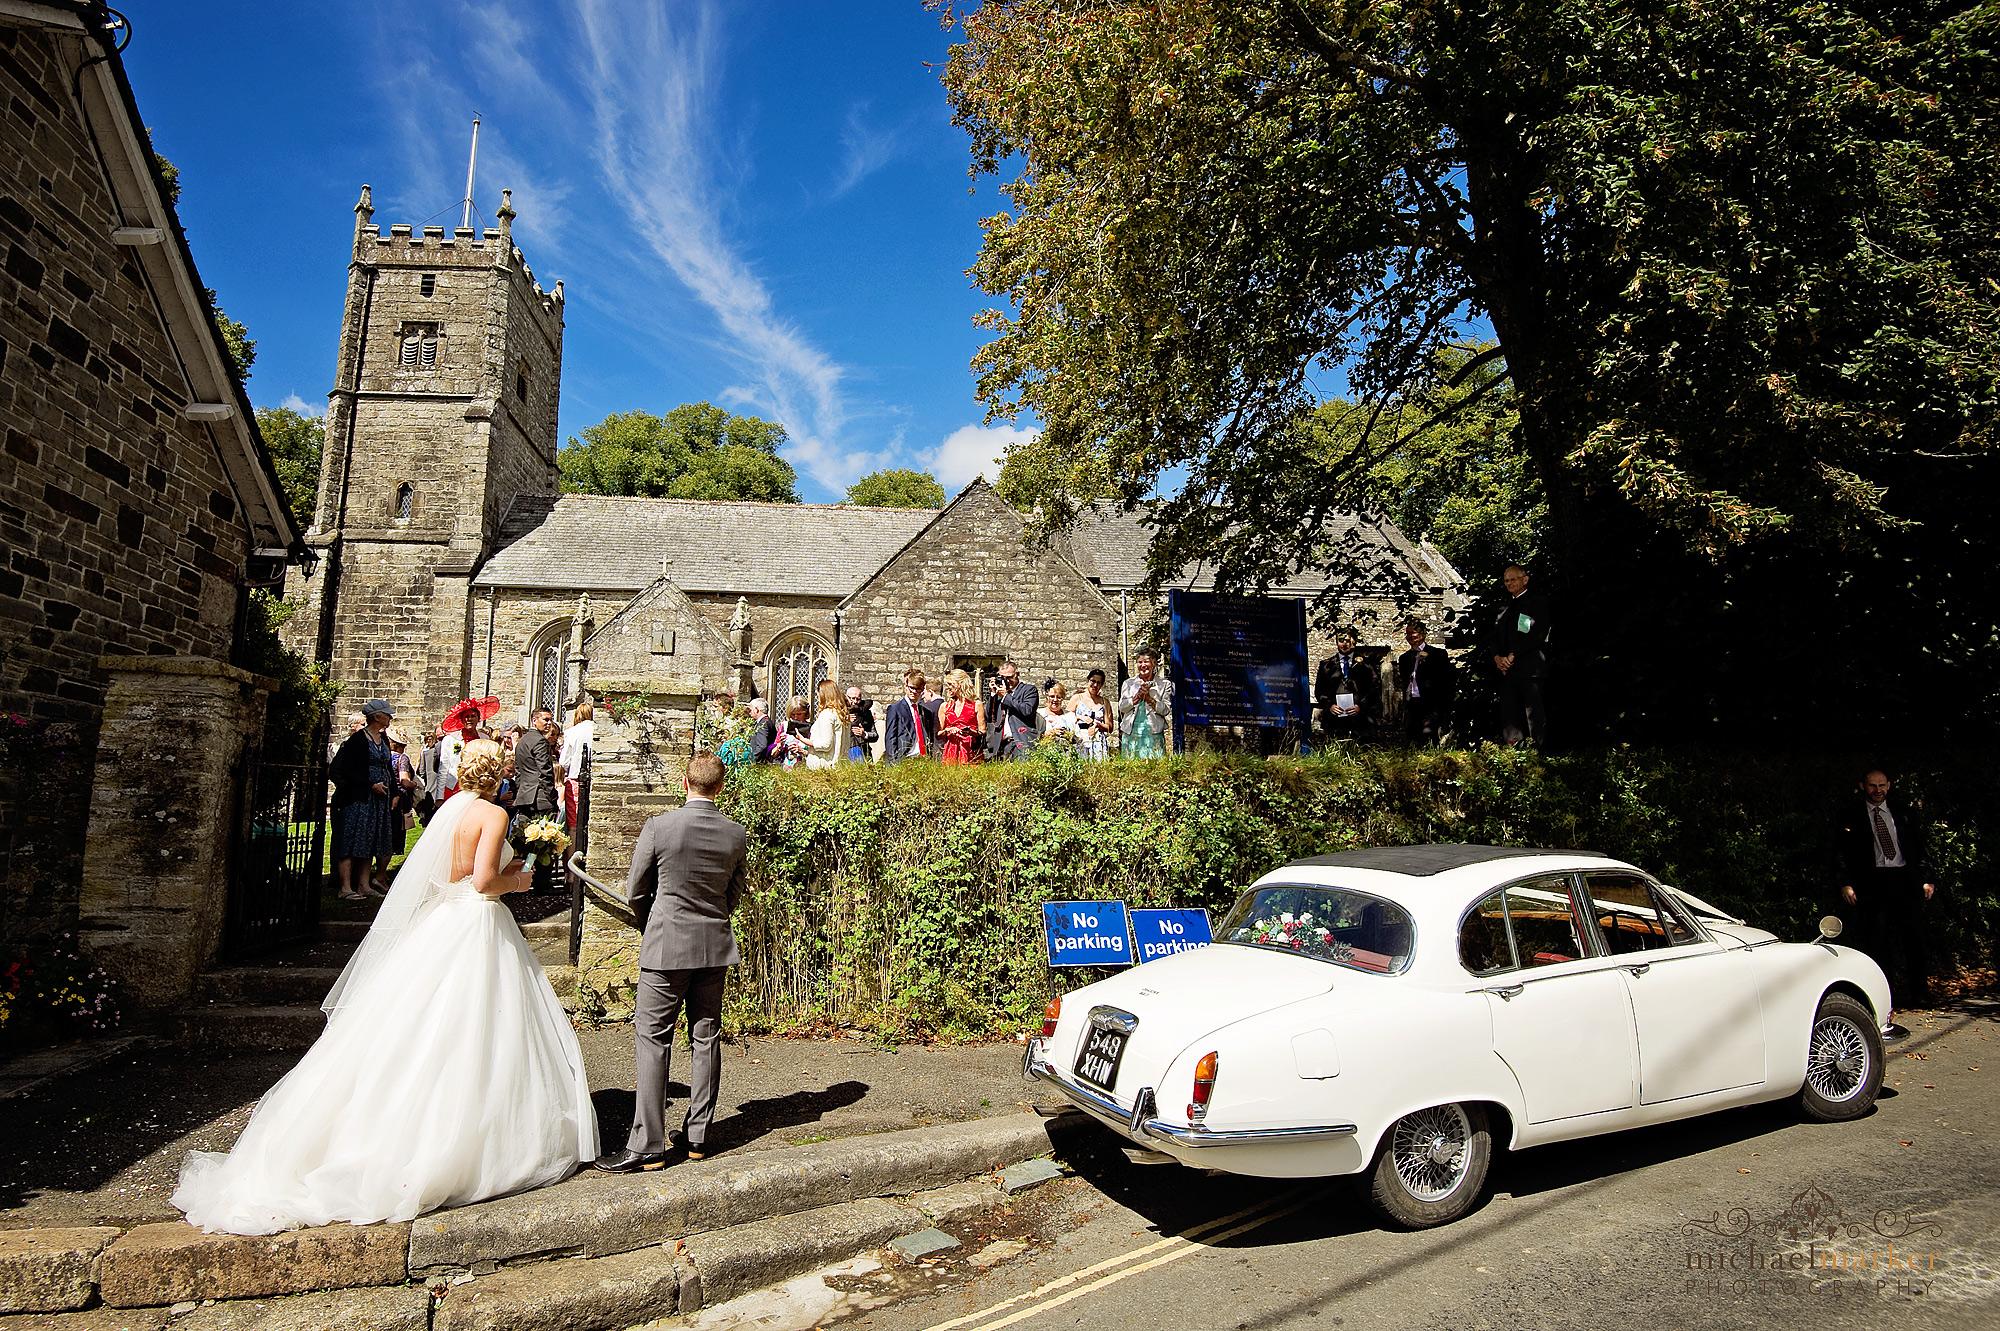 TwoBridges-wedding-2015-15